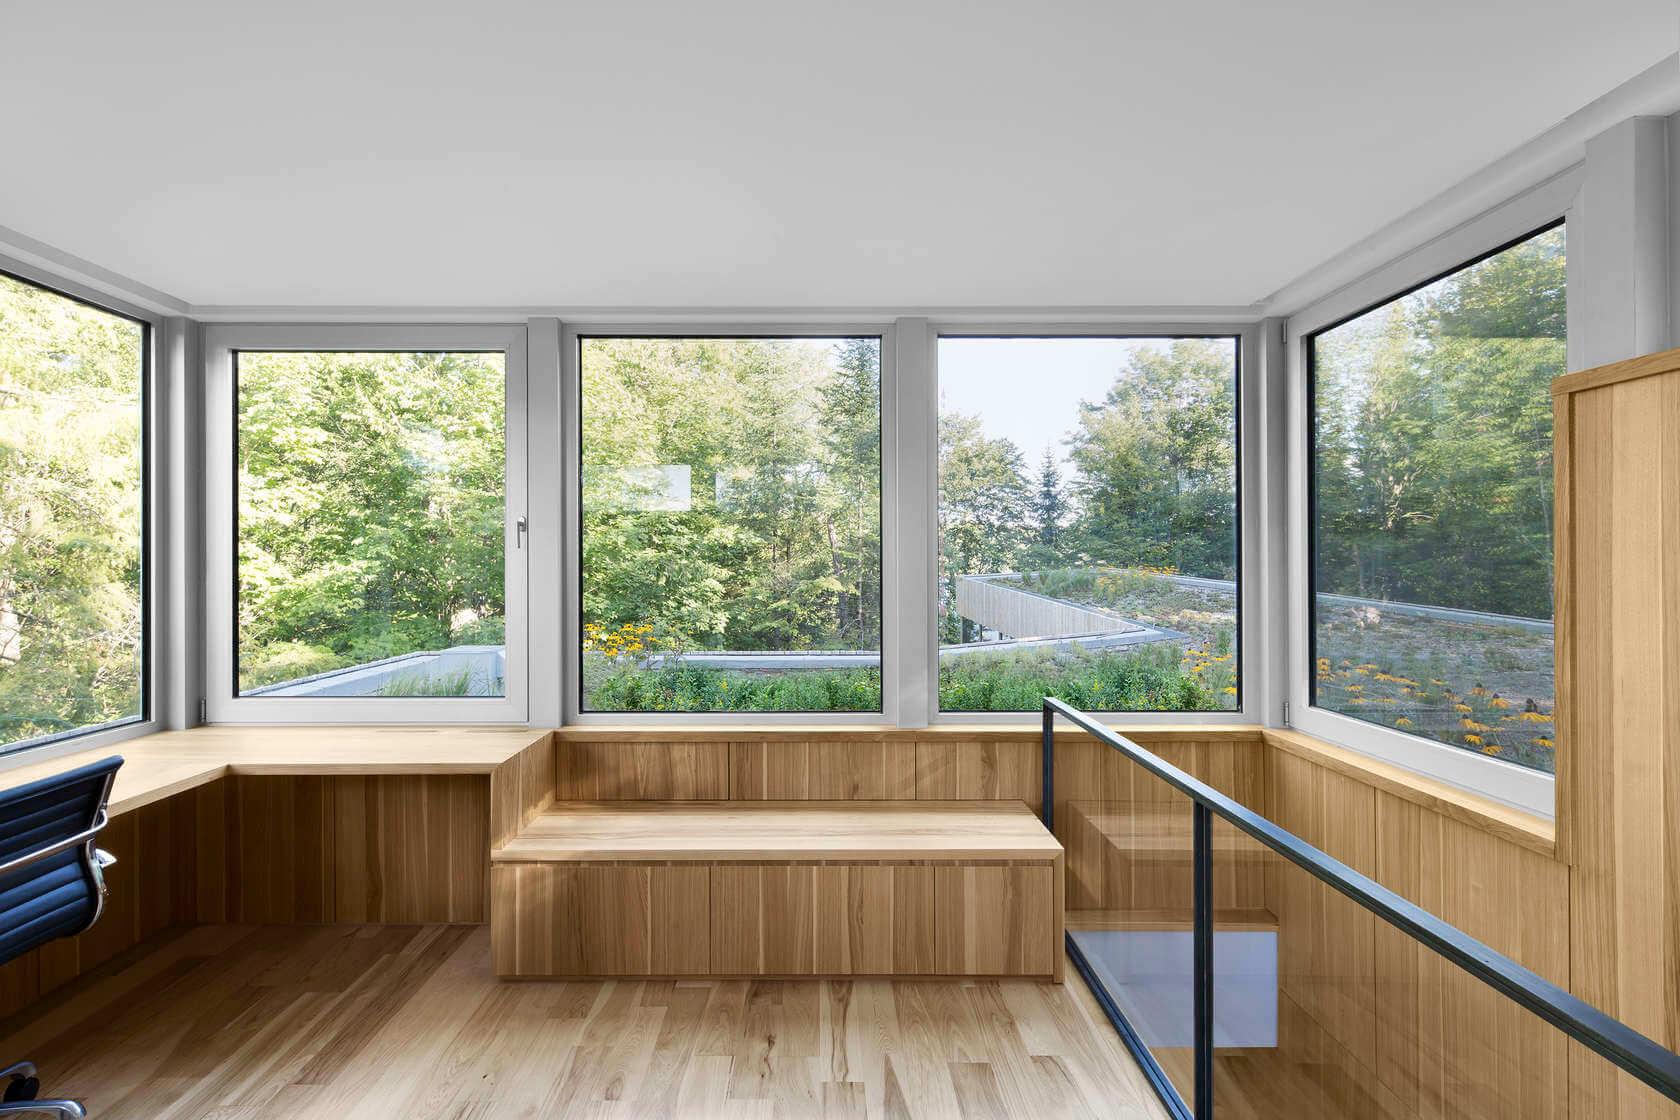 architecture_house_apartment_design_studia_interiors_osnovadesign_osnova_poltava_10